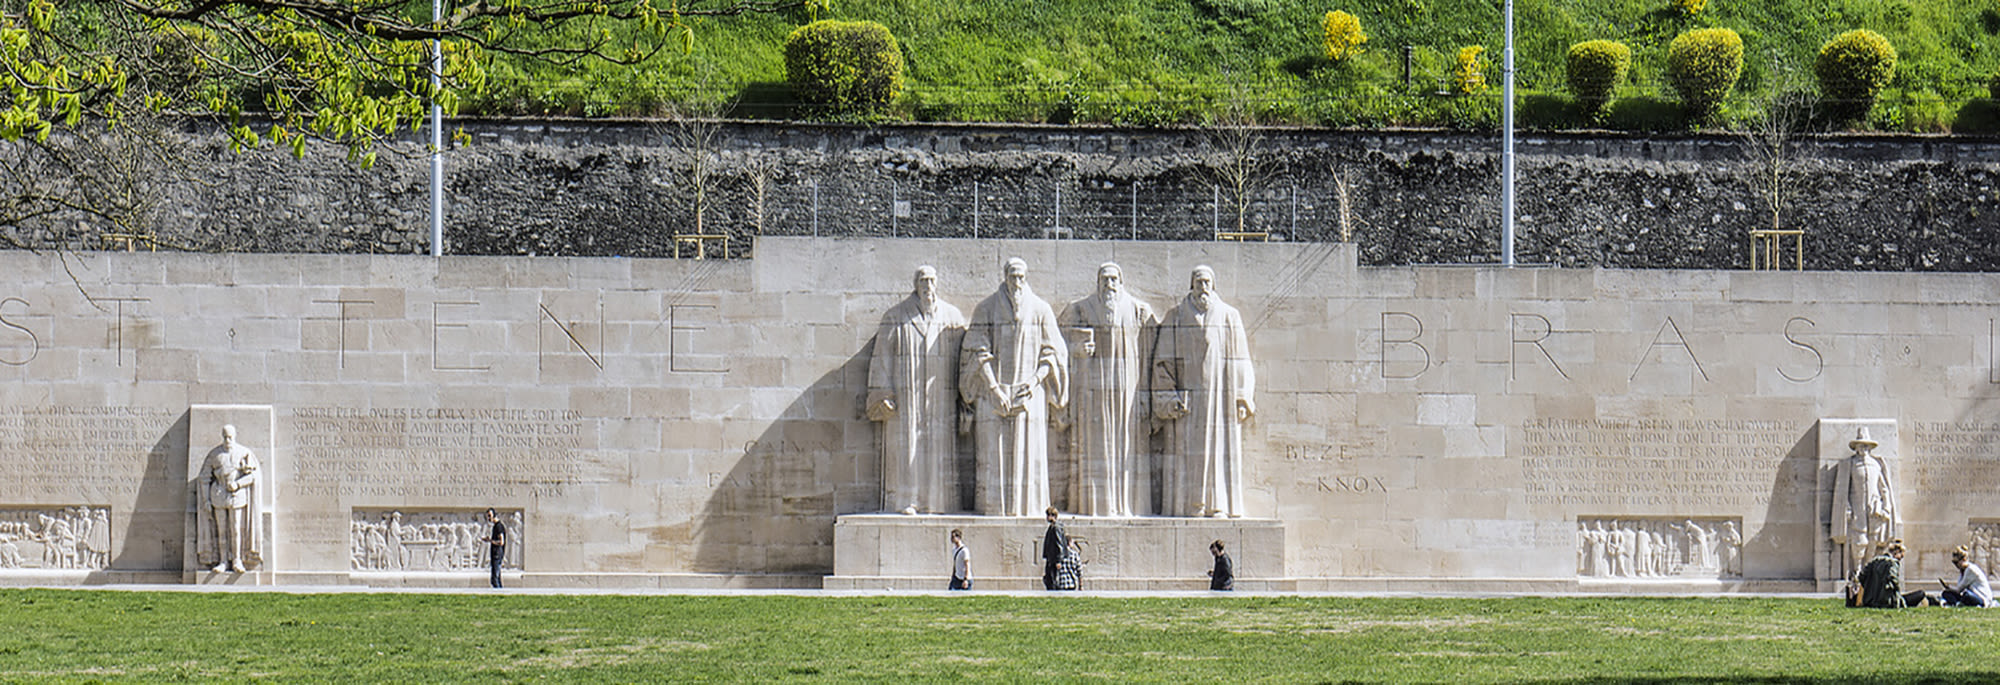 reformation monument geneva